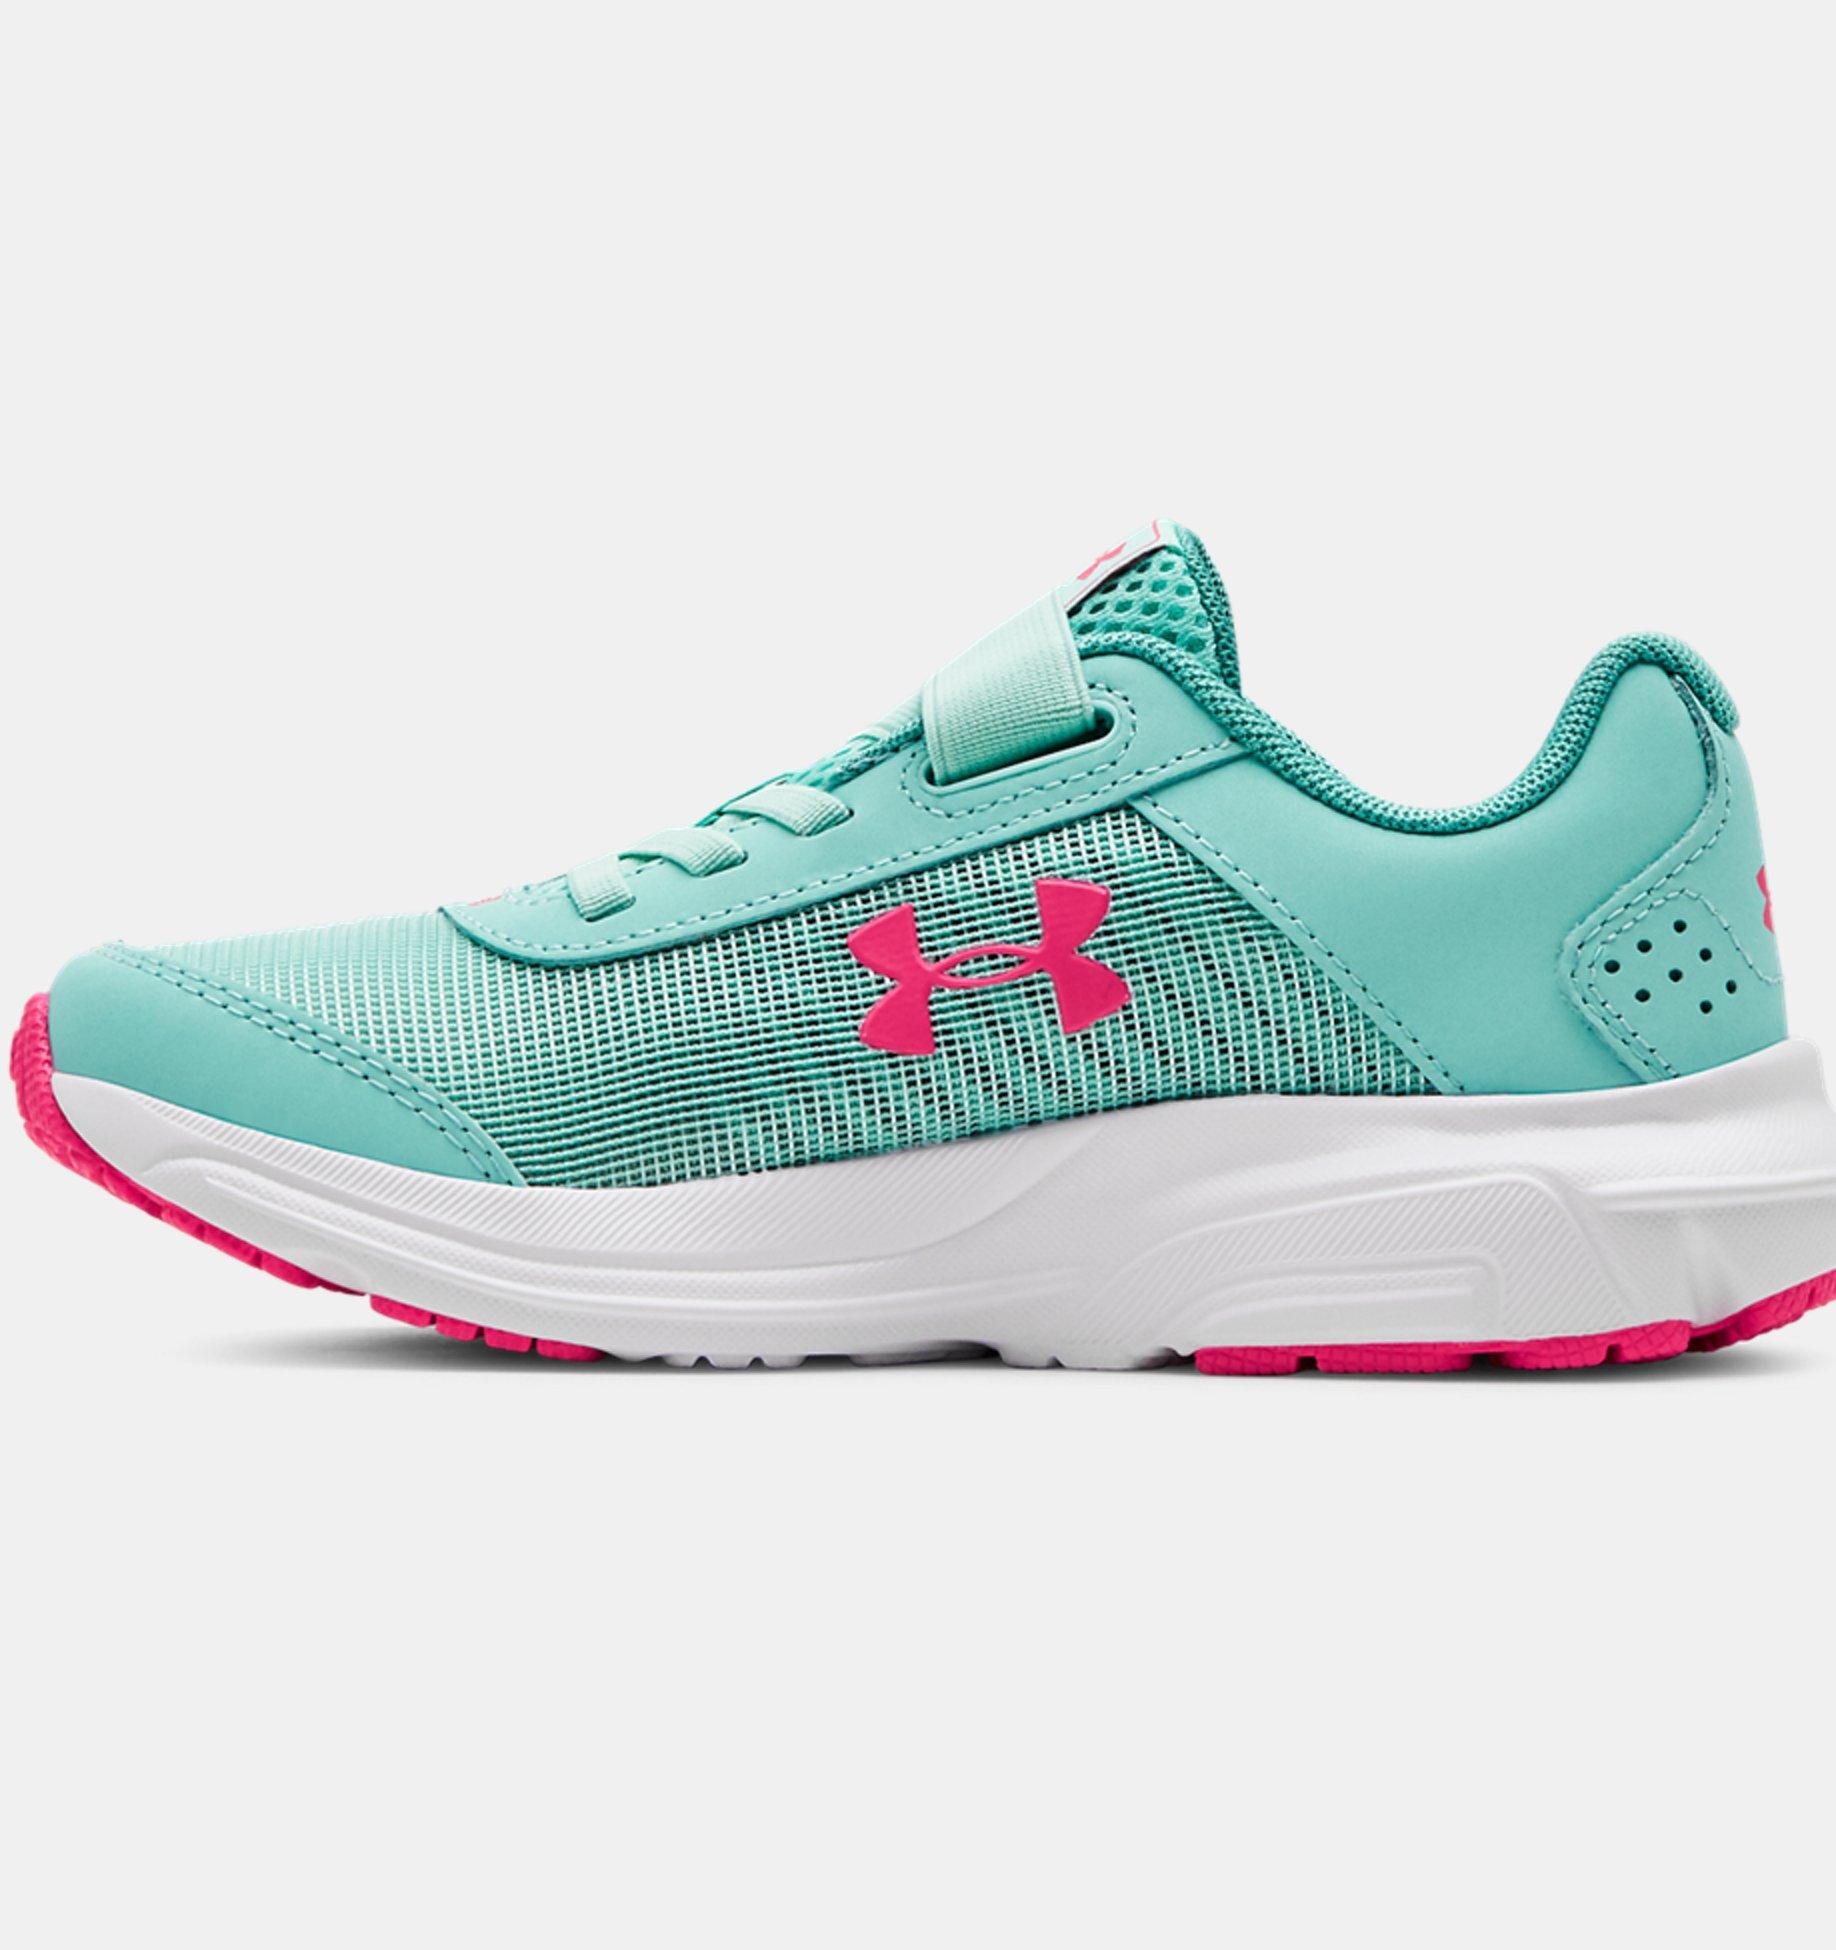 ... Girls  Pre-School UA Rave 2 NP AC Running Shoes ... 20fa6c75f6f